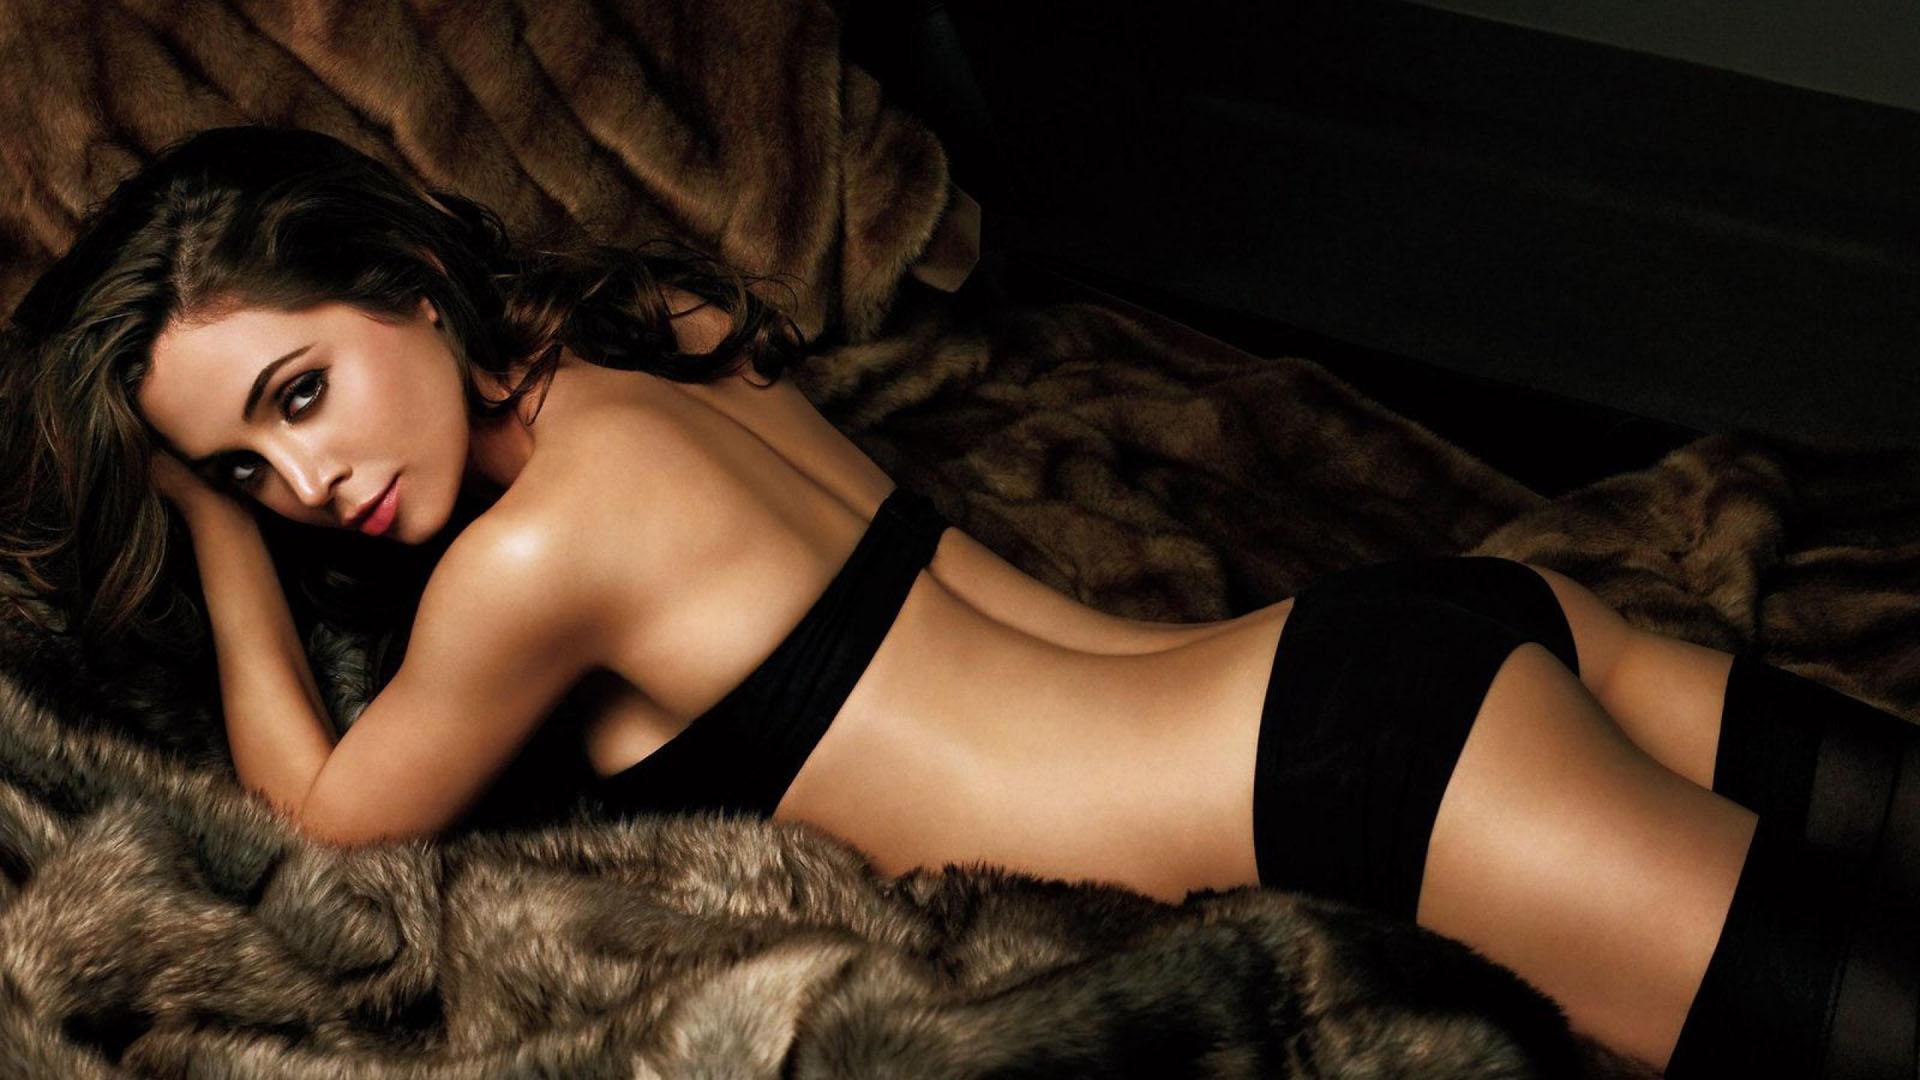 Eliza Dushku High Quality Background on Wallpapers Vista